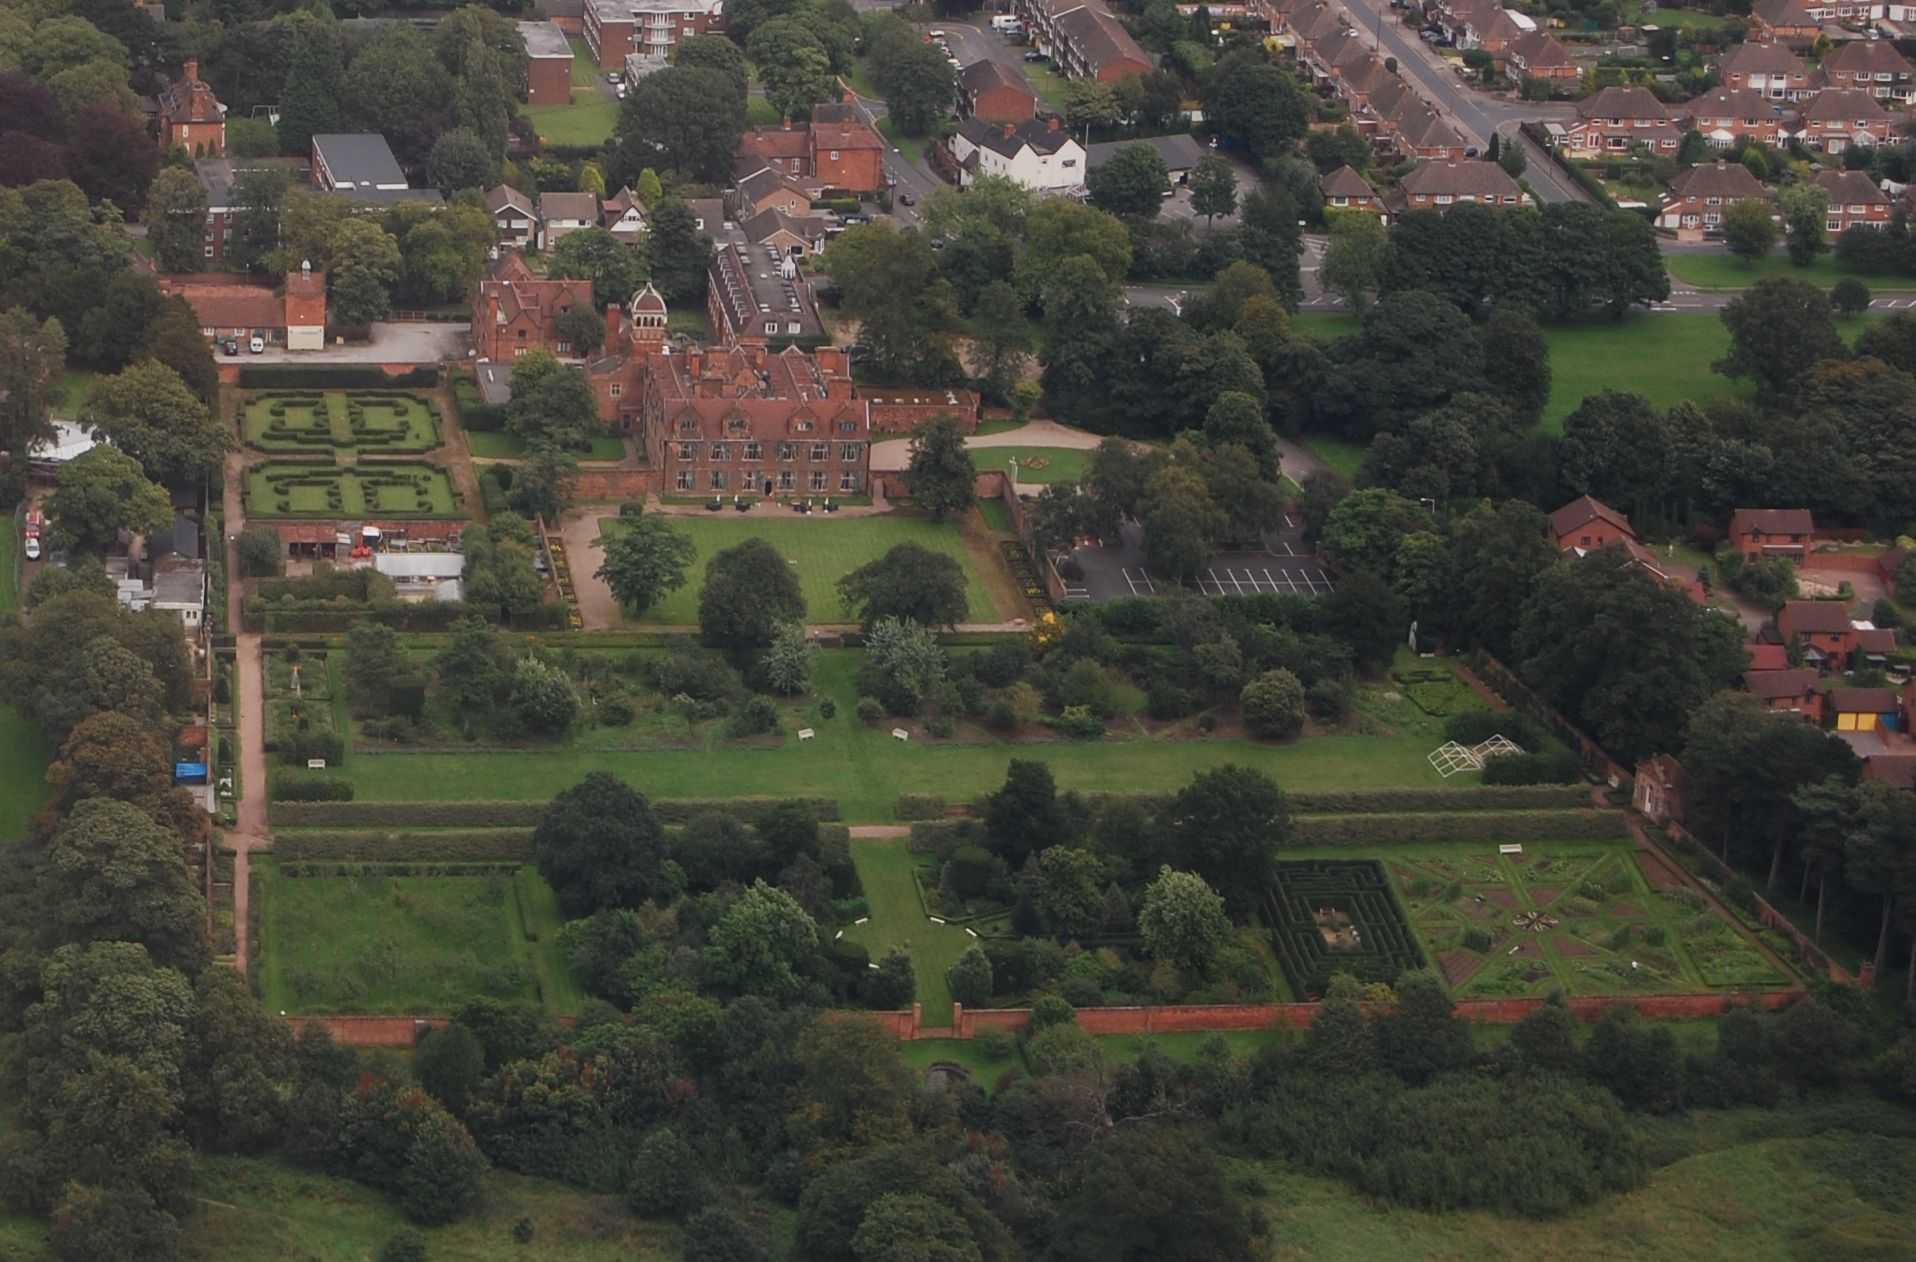 Castle Bromwich Hall Gardens, Birmingham